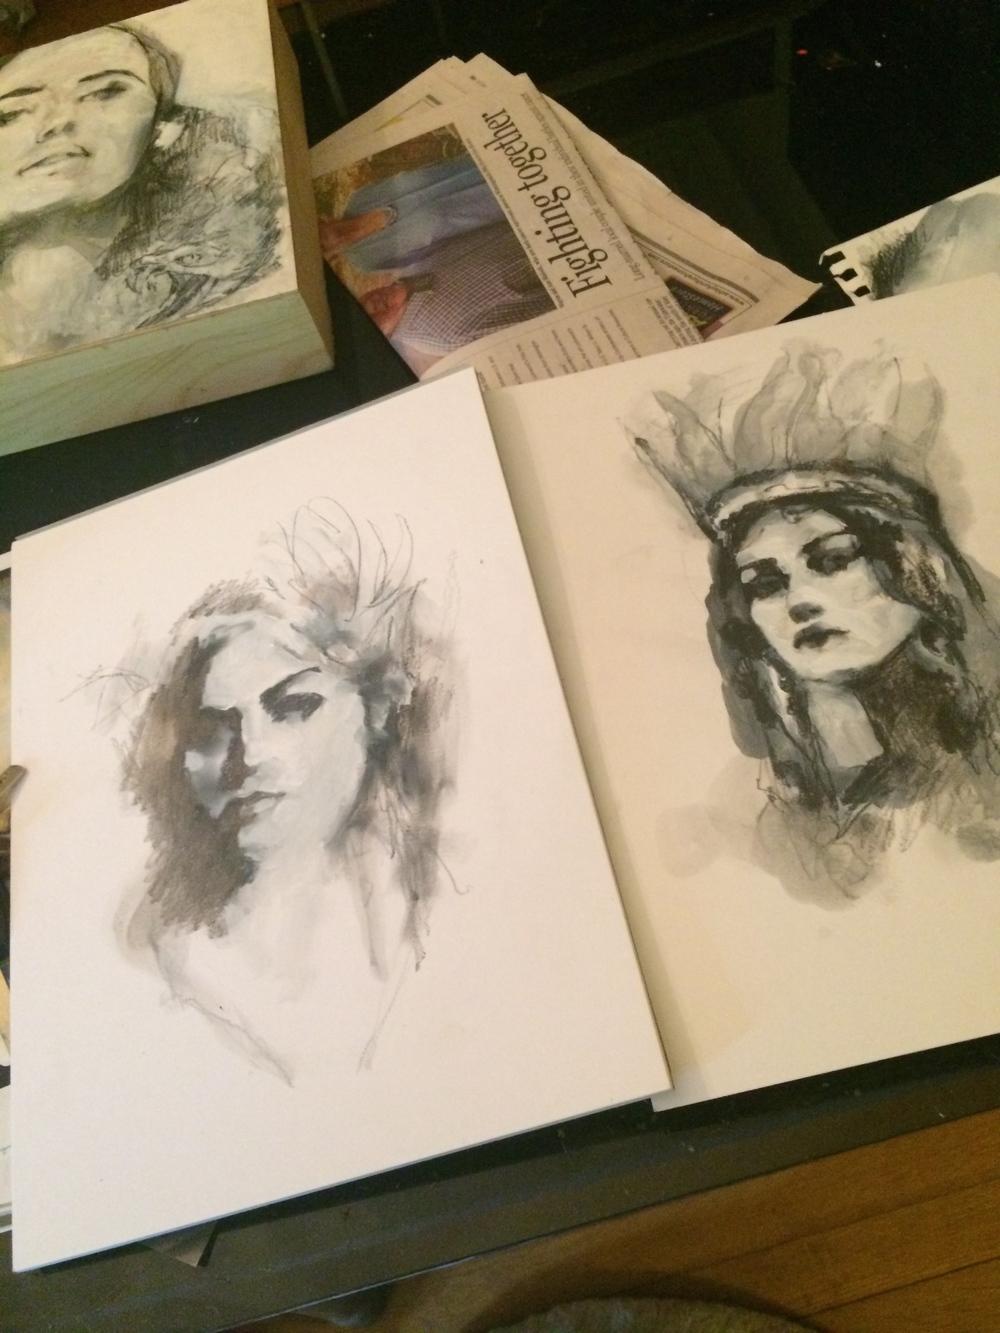 Left: Adrienne, Libra